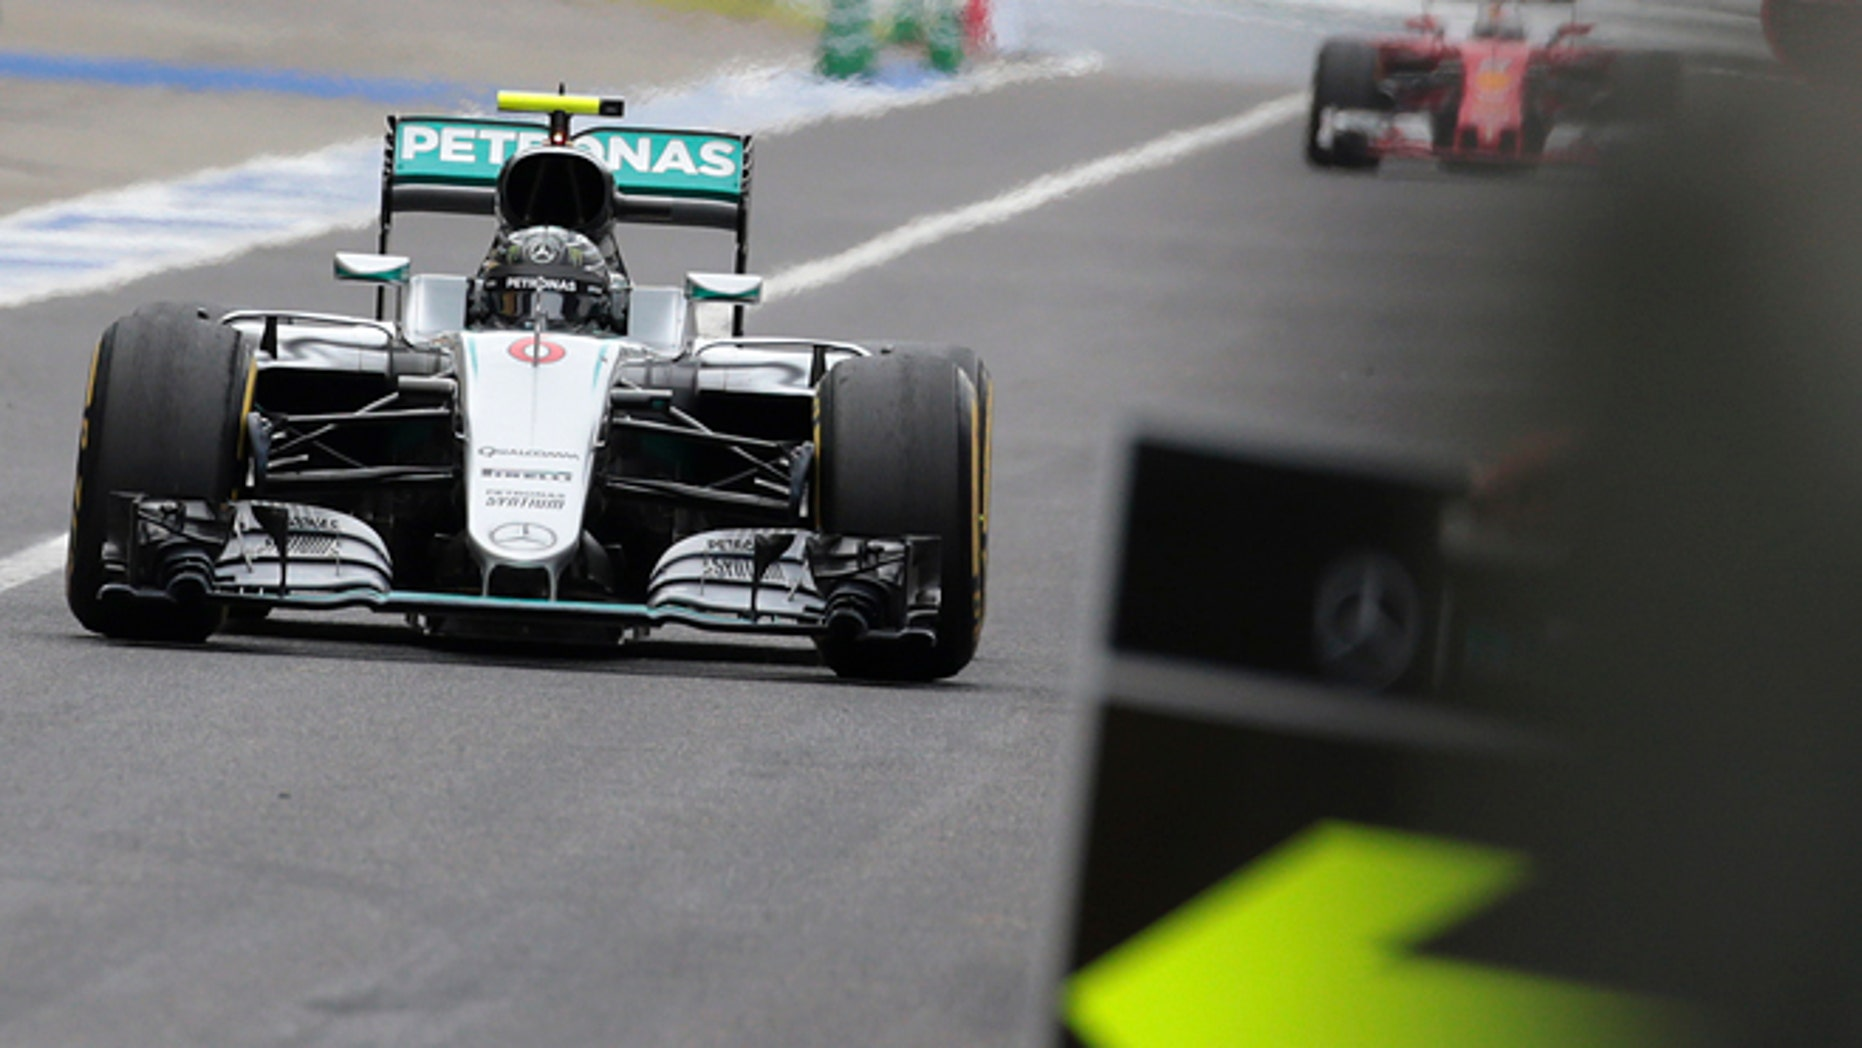 Mercedes driver Nico Rosberg of Germany returns to the pit lane on the way to winning the Japanese Formula One Grand Prix at the Suzuka International Circuit in Suzuka, central Japan, Sunday, Oct. 9, 2016. (Yuya Shino/Pool Photo via AP)